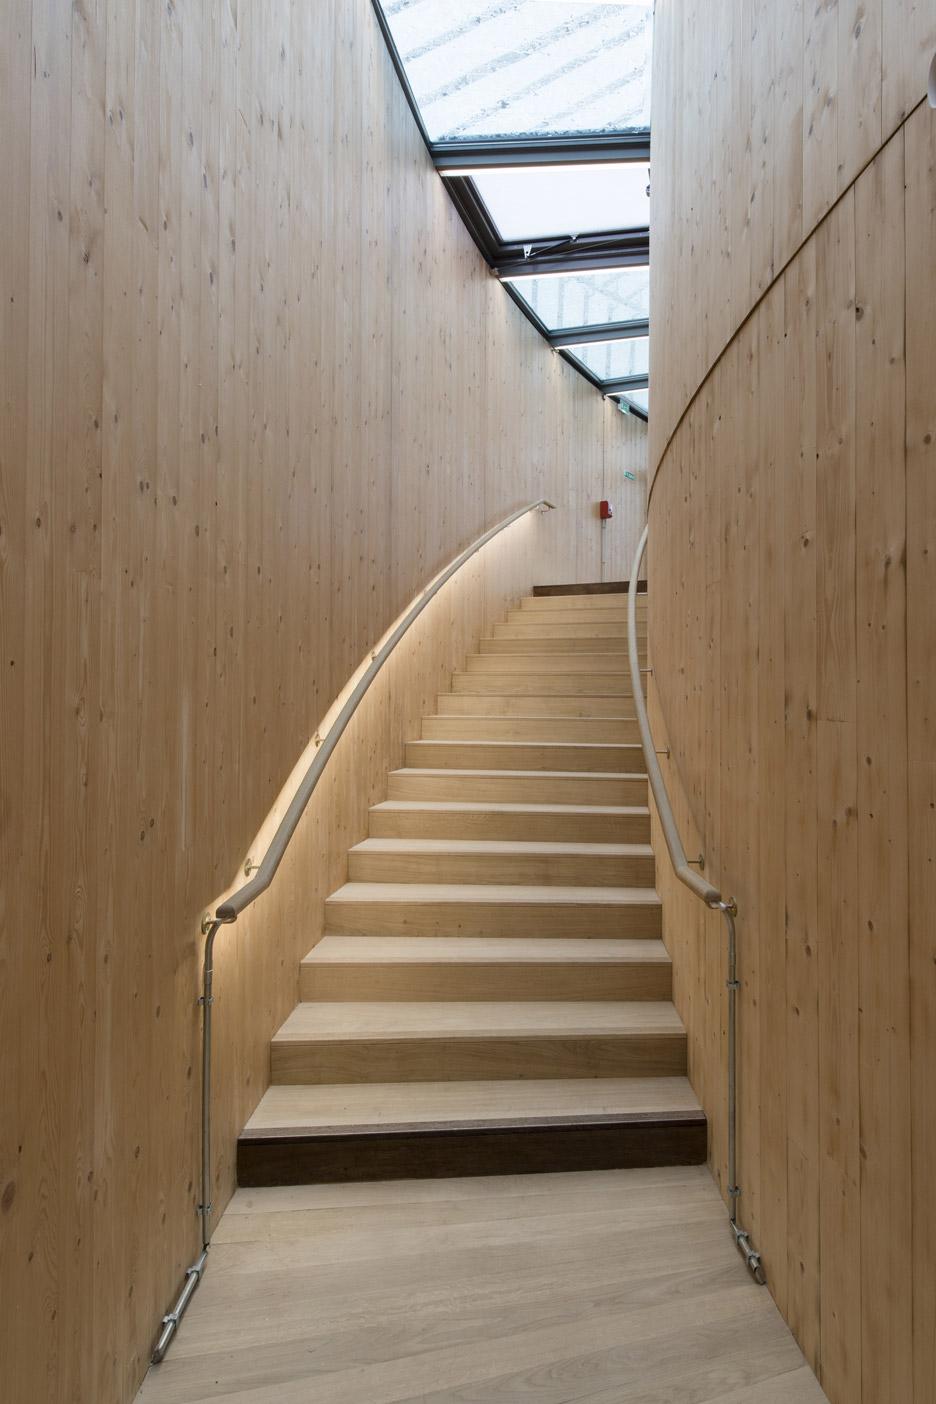 andrew-todd-theatre-pas-de-calais-globe-elizabethan-france-cross-laminated-timber_dezeen_936_26